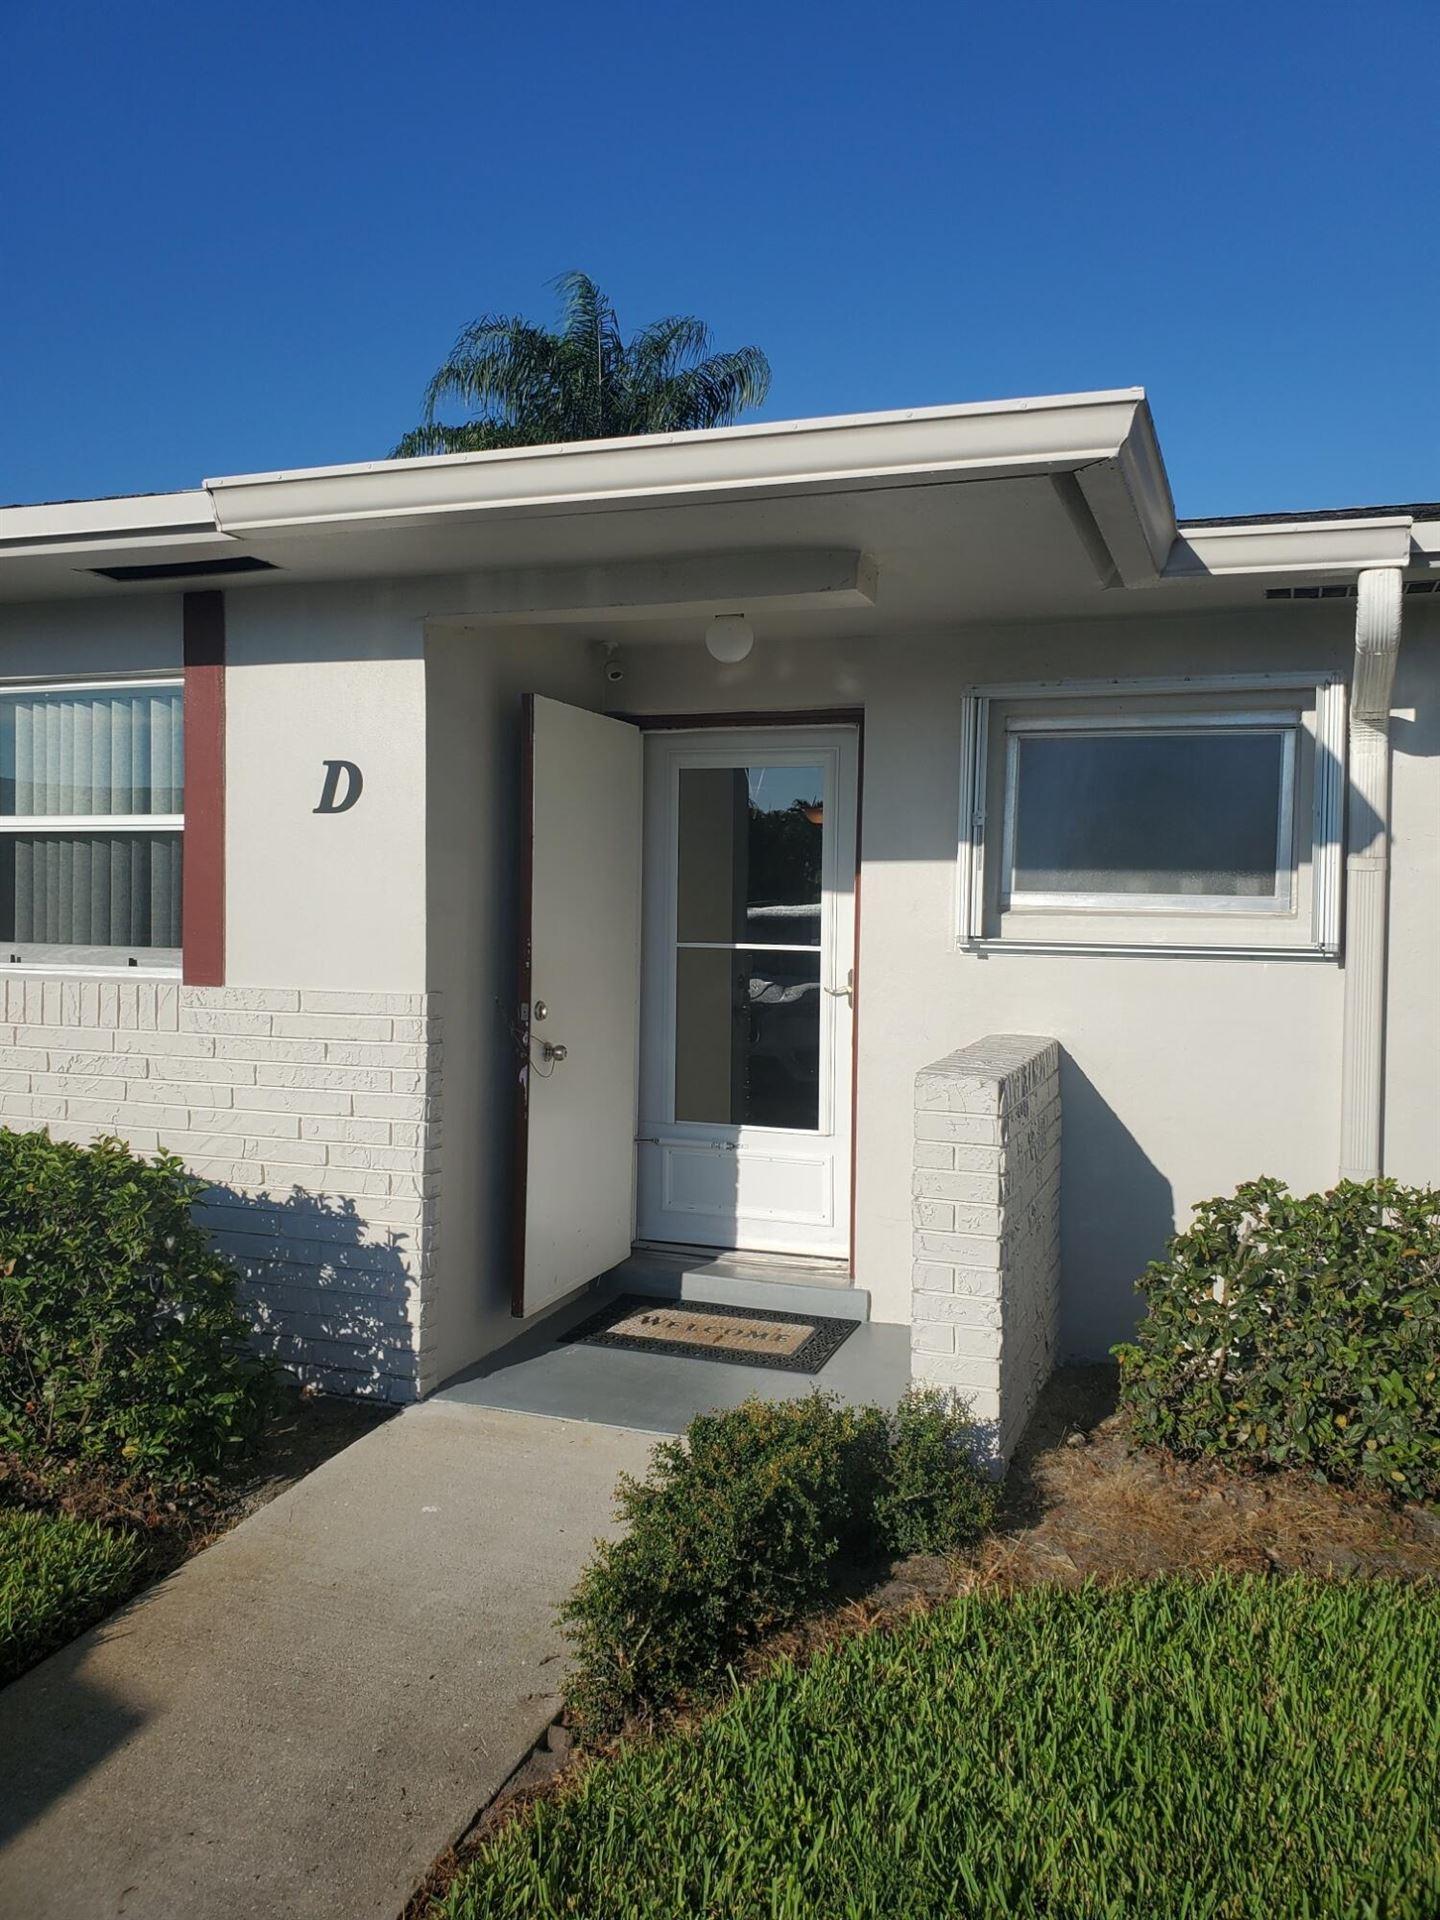 2775 Emory Drive W #D, West Palm Beach, FL 33415 - MLS#: RX-10751930